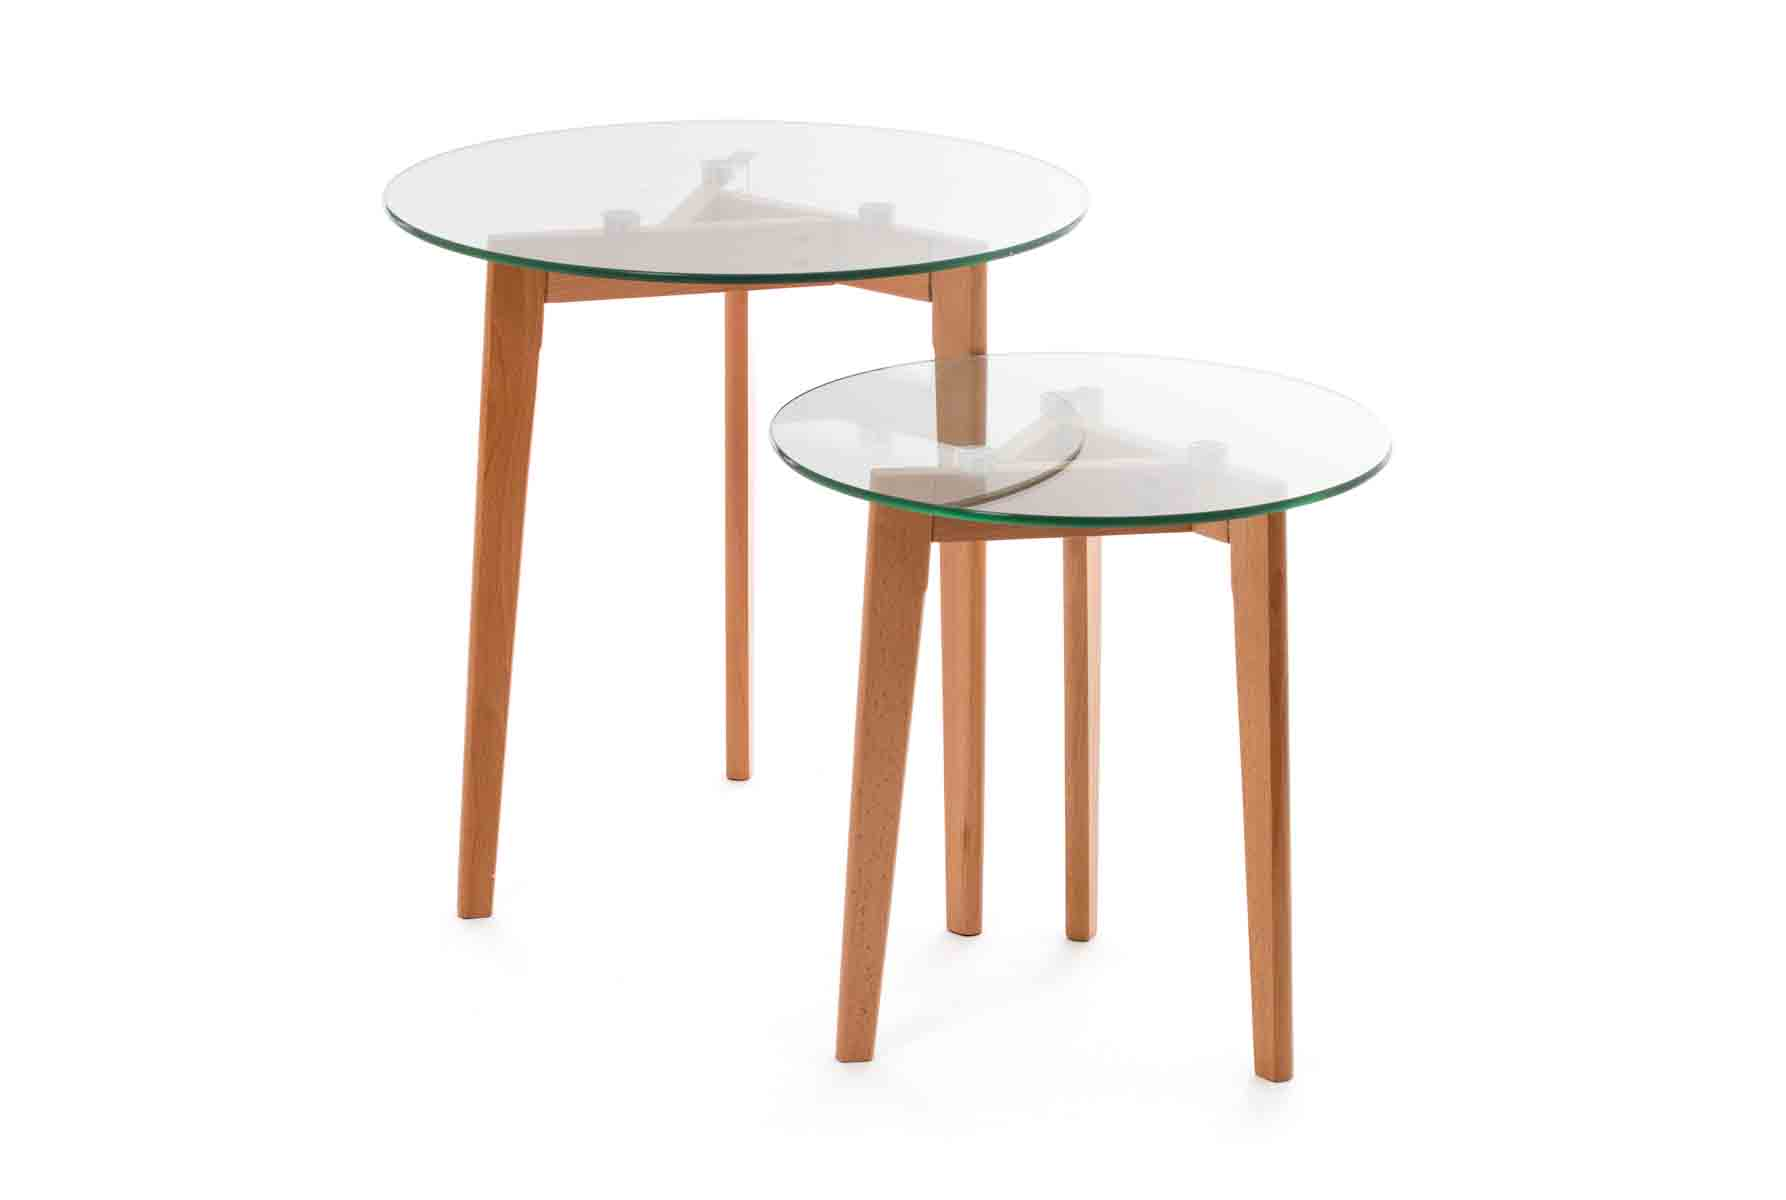 Design Glazen Sidetable.Sidetable Design Hout Glas 2 Stuks